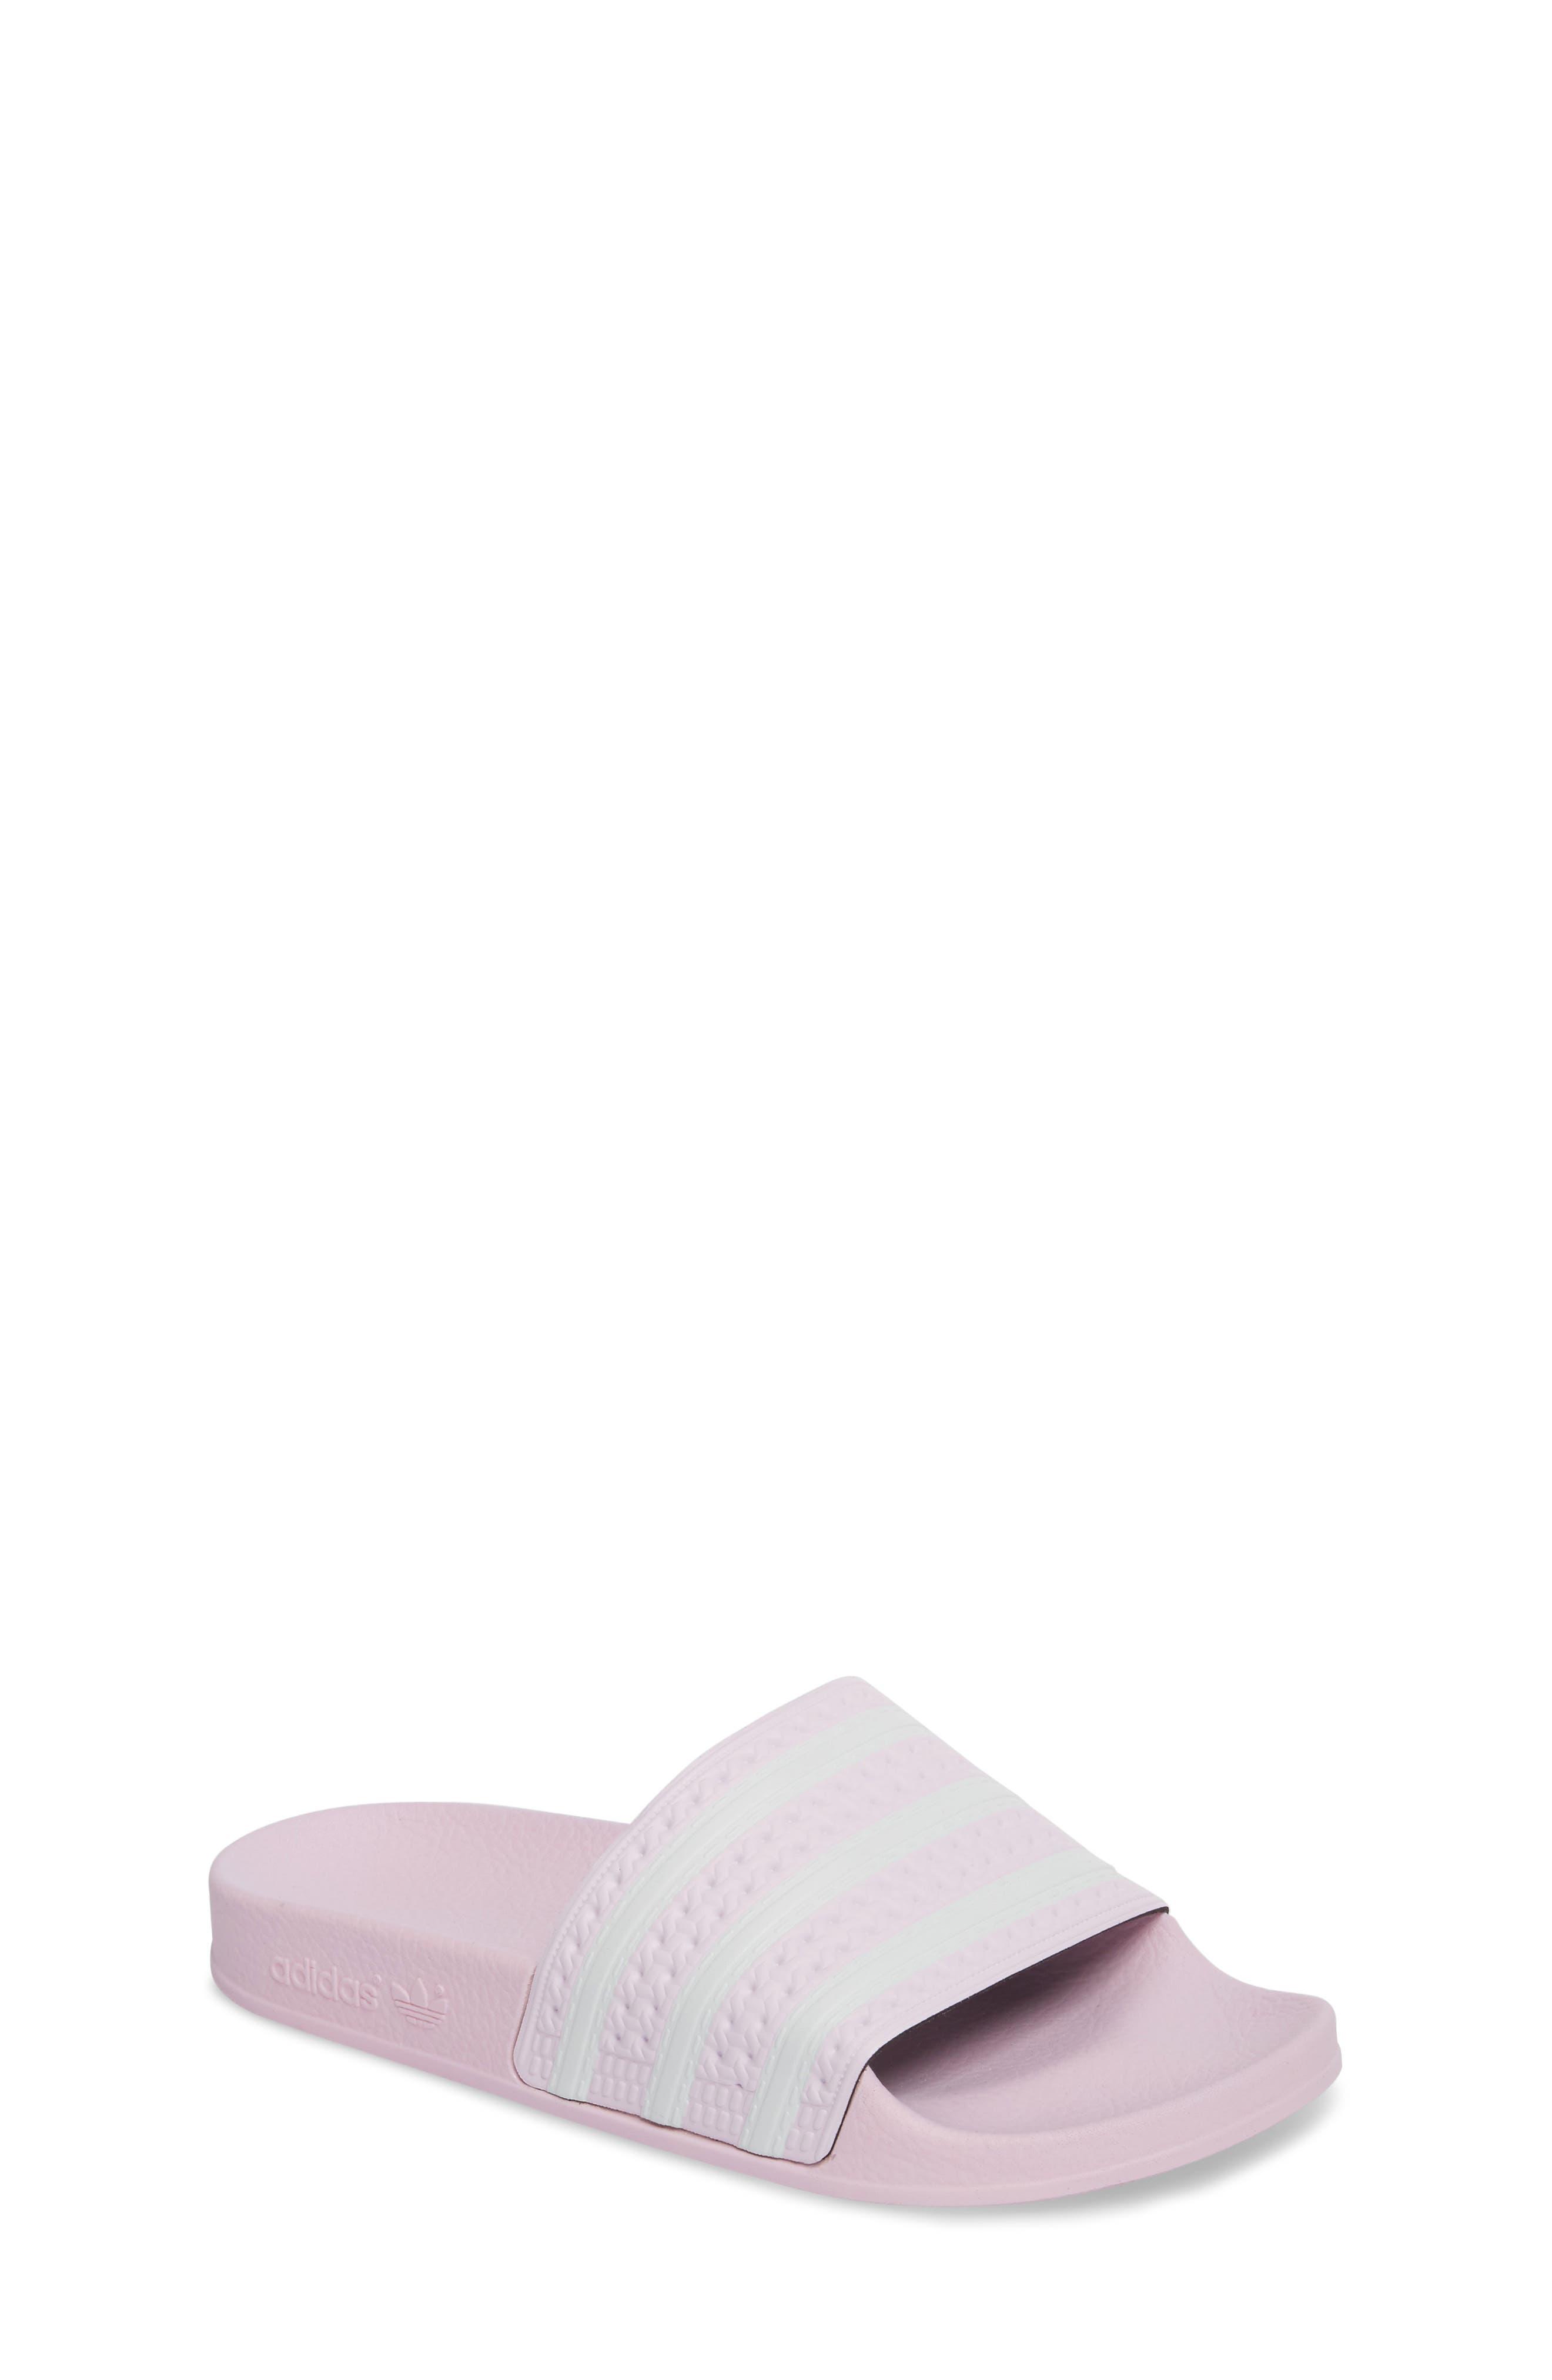 Adilette Sandal,                             Main thumbnail 1, color,                             Aero Pink /  Ftwr